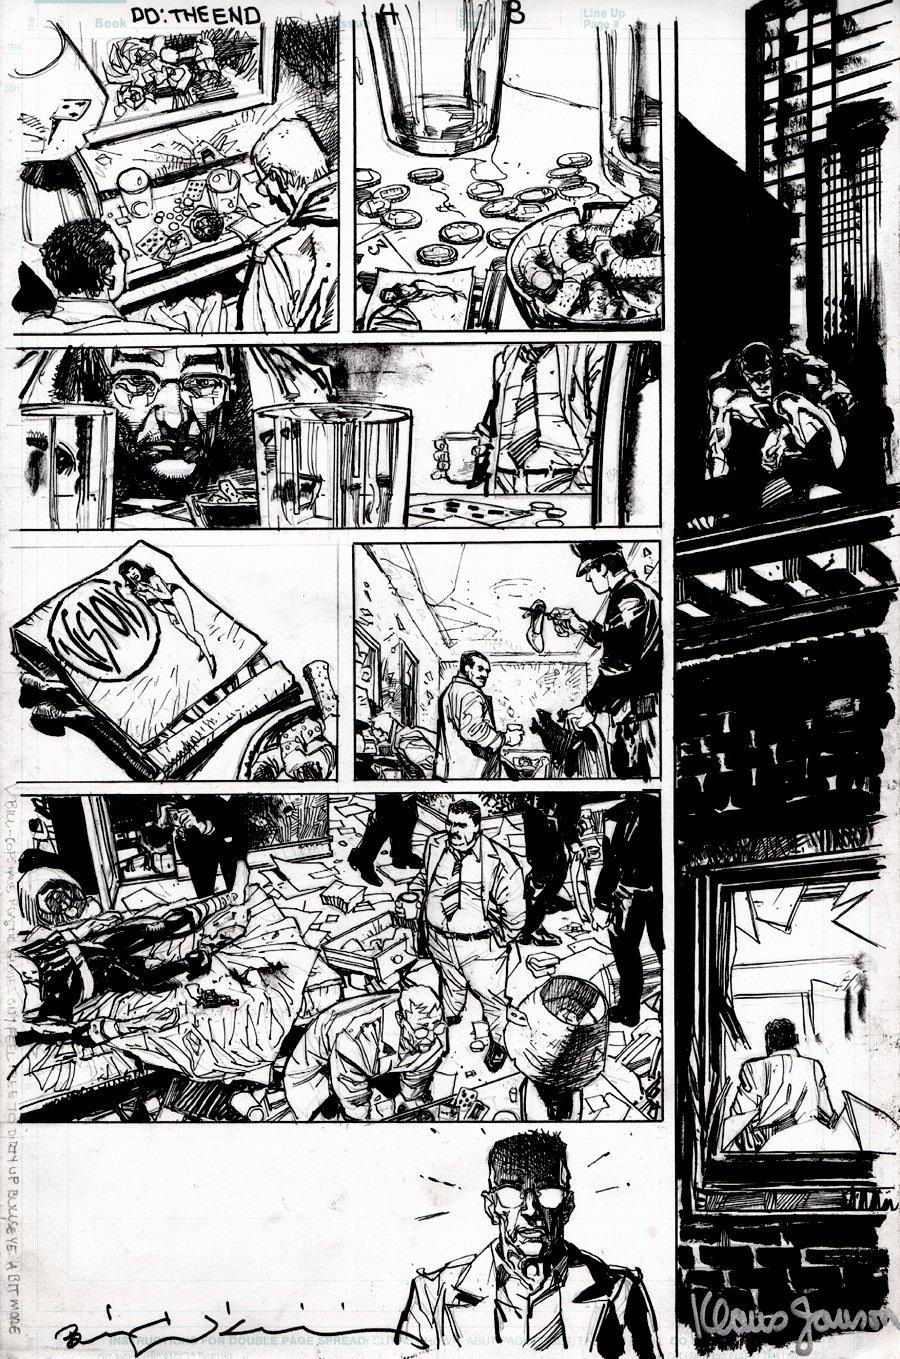 Daredevil: End of Days #4 p 8 (DEATH OF BULLSEYE!) 2012